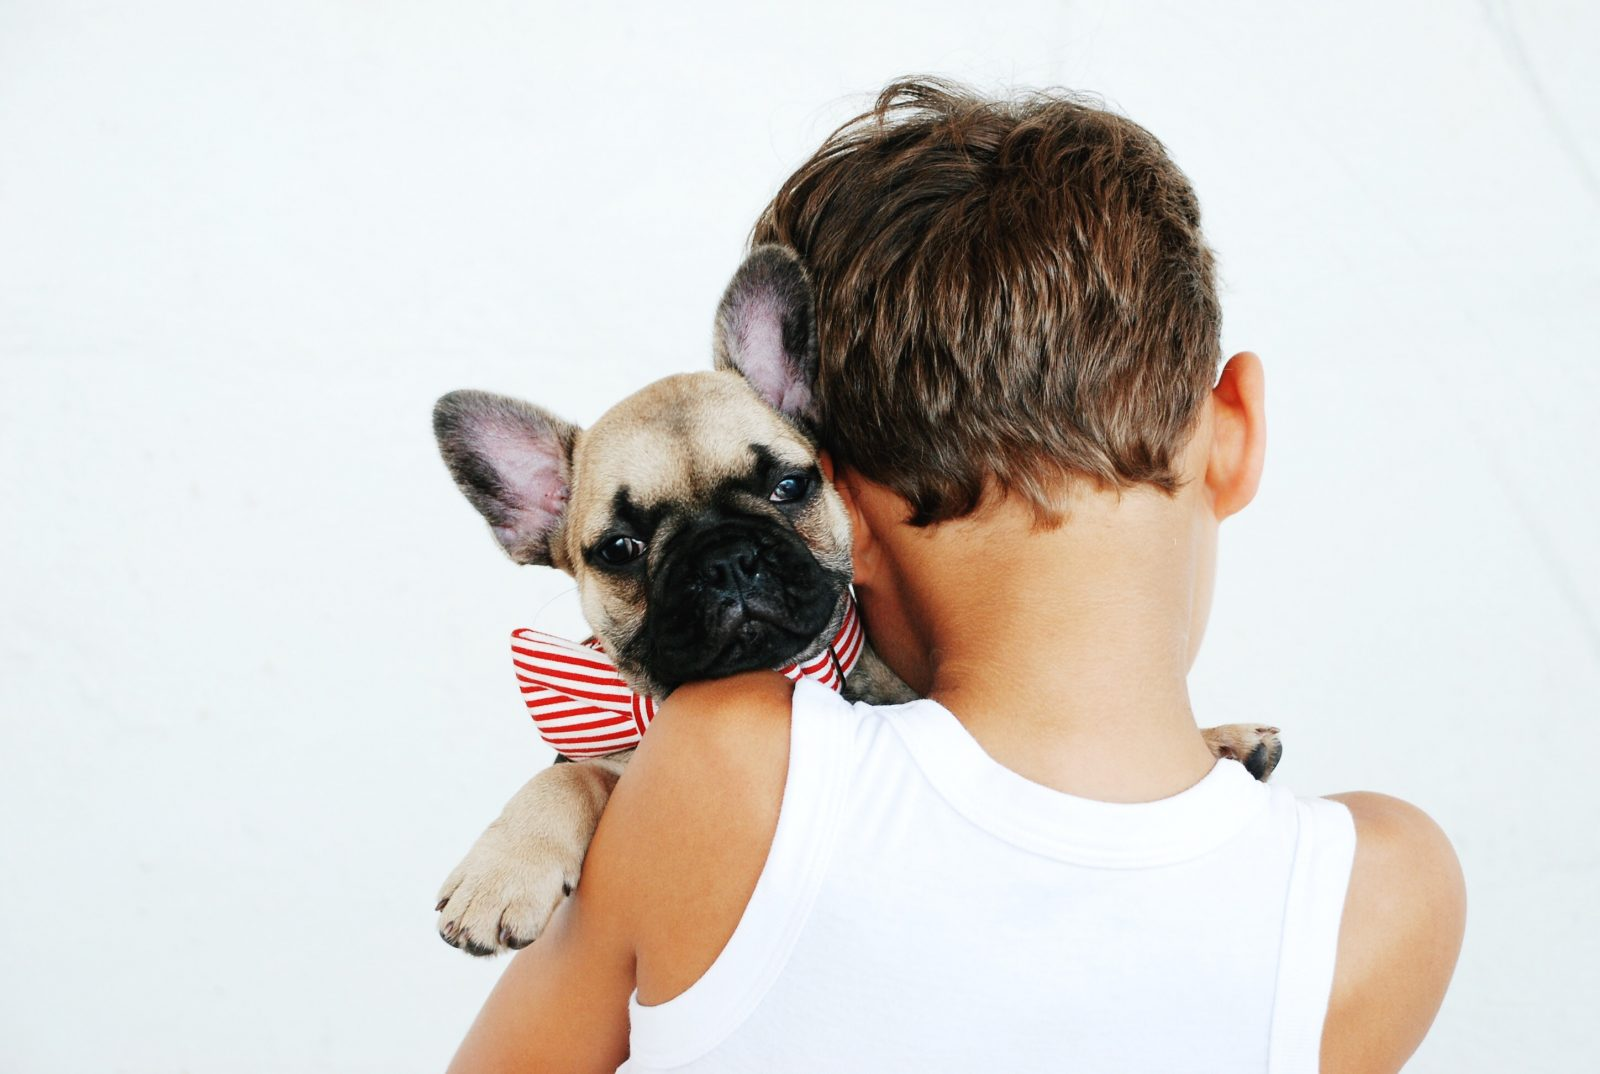 Pet dander is an allergy trigger.